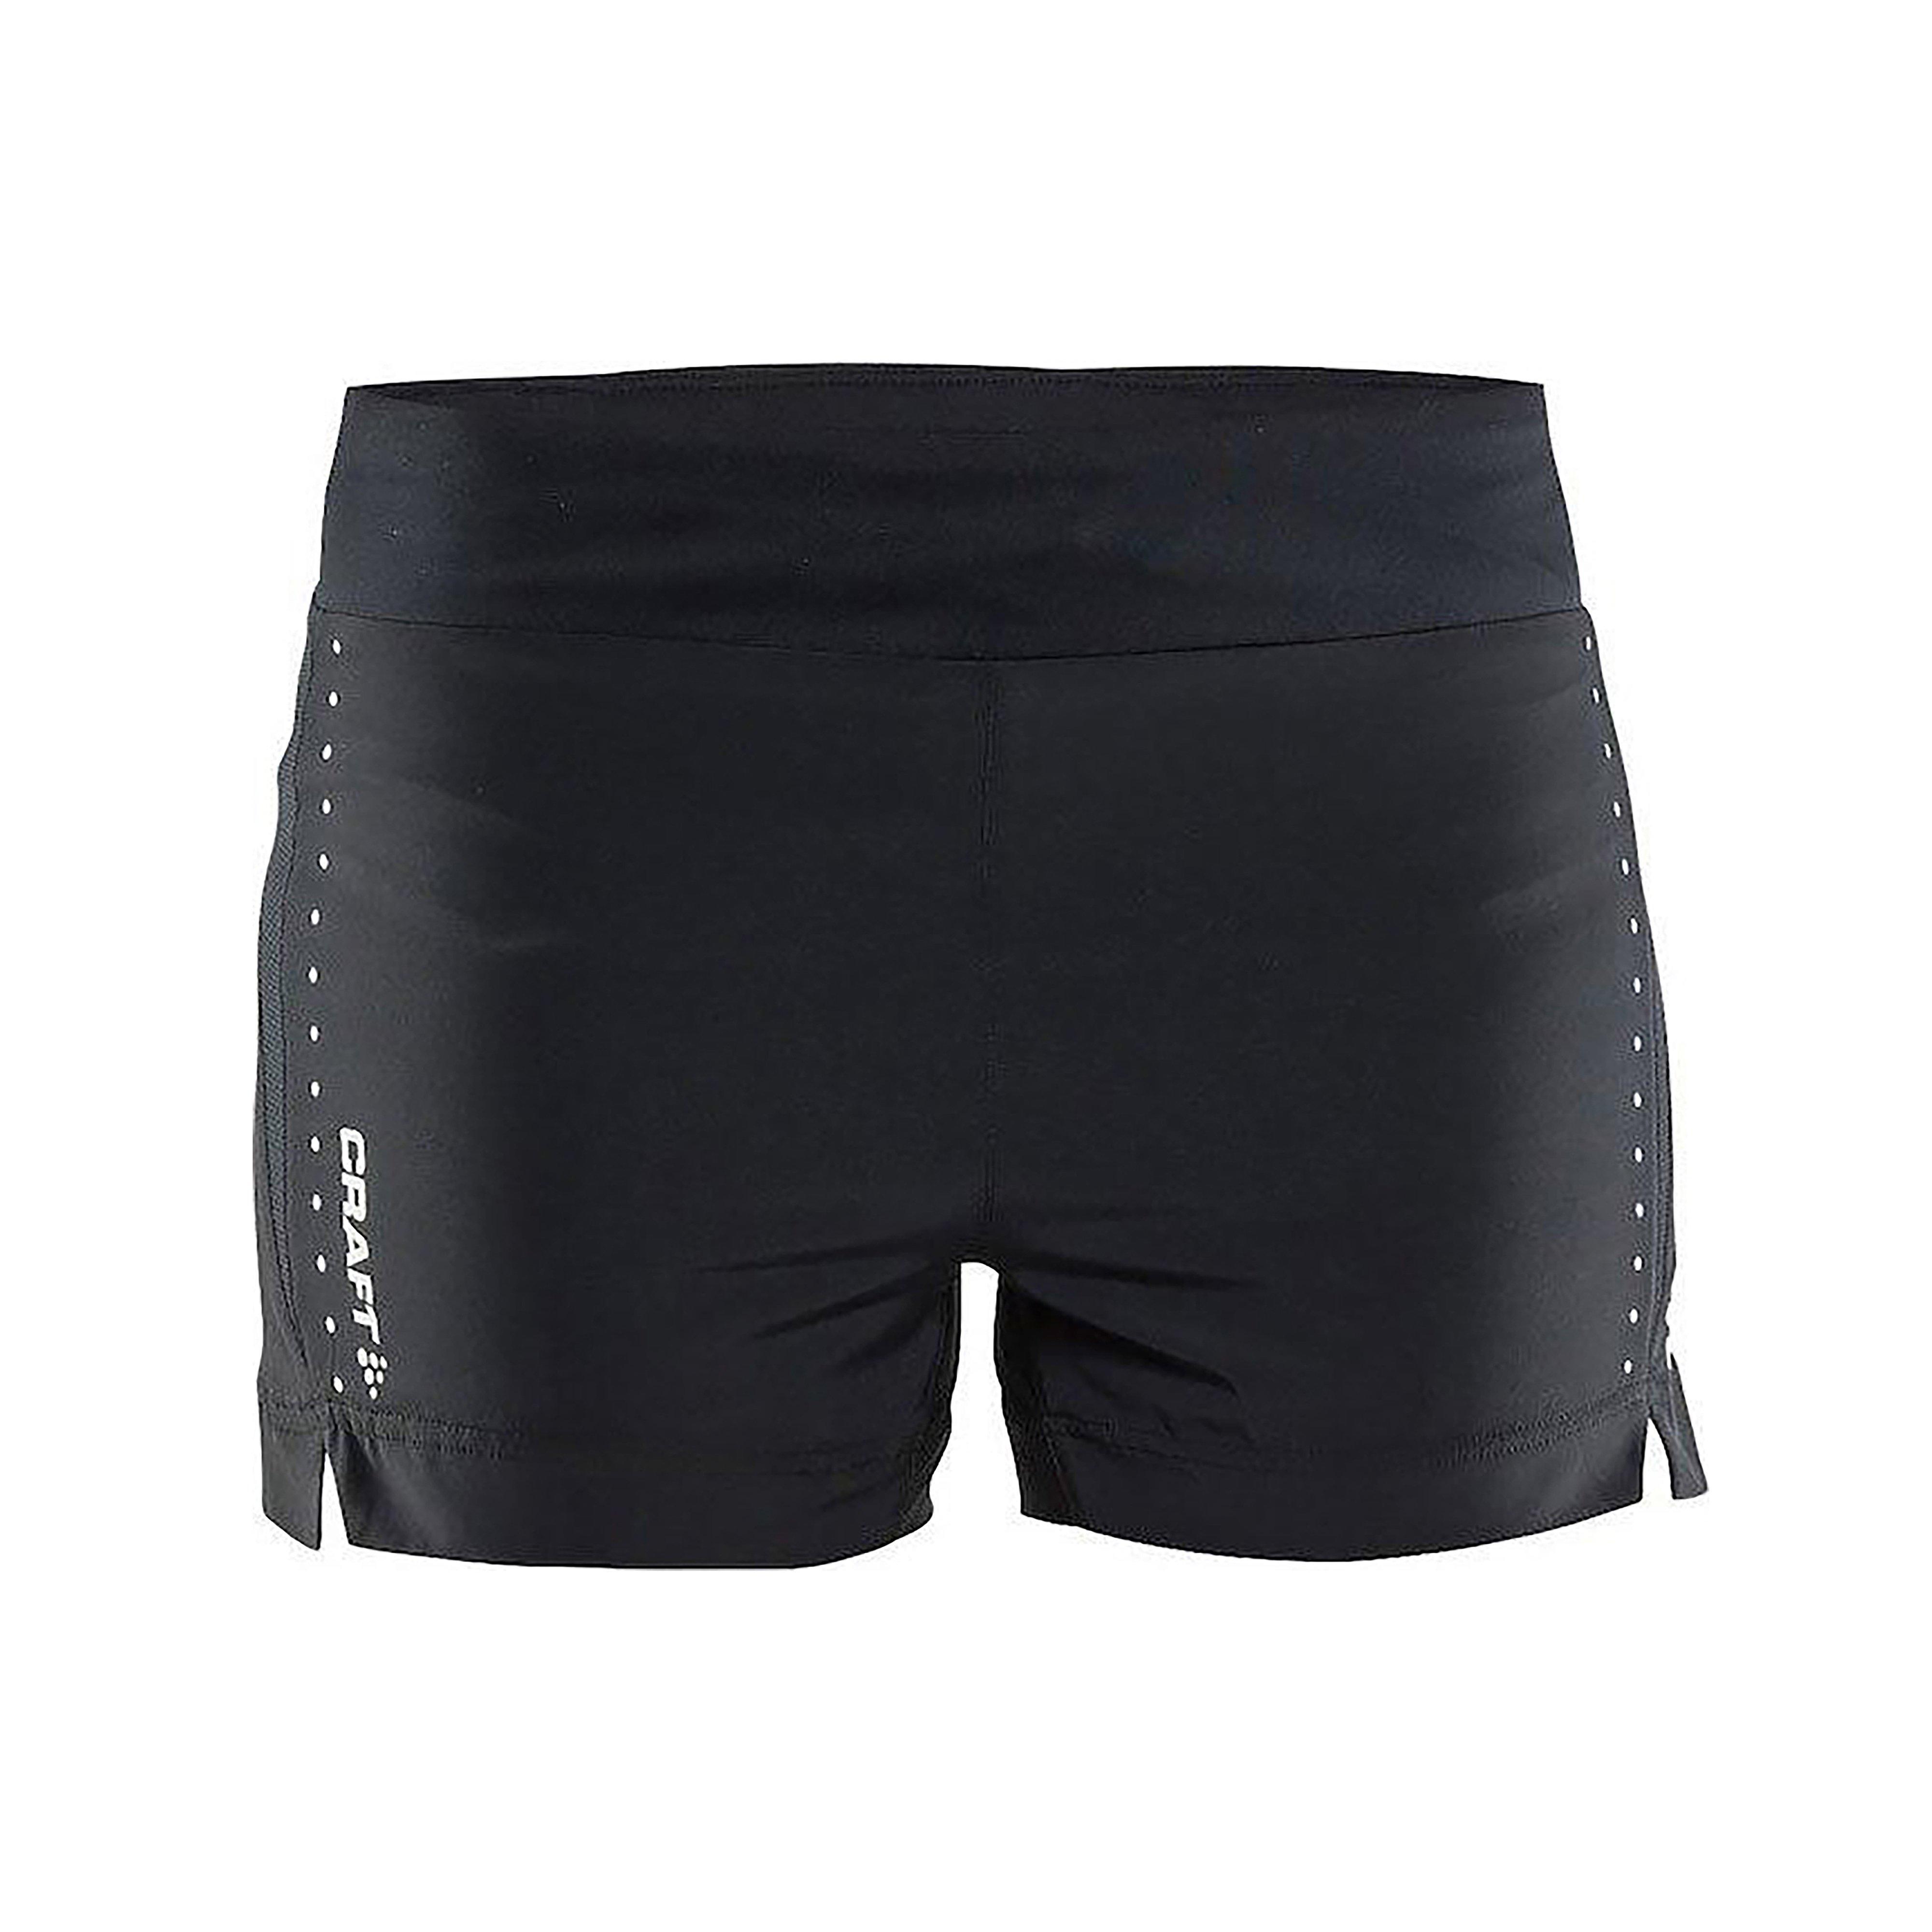 "Craft Craft Womens Essential 5"" Shorts"